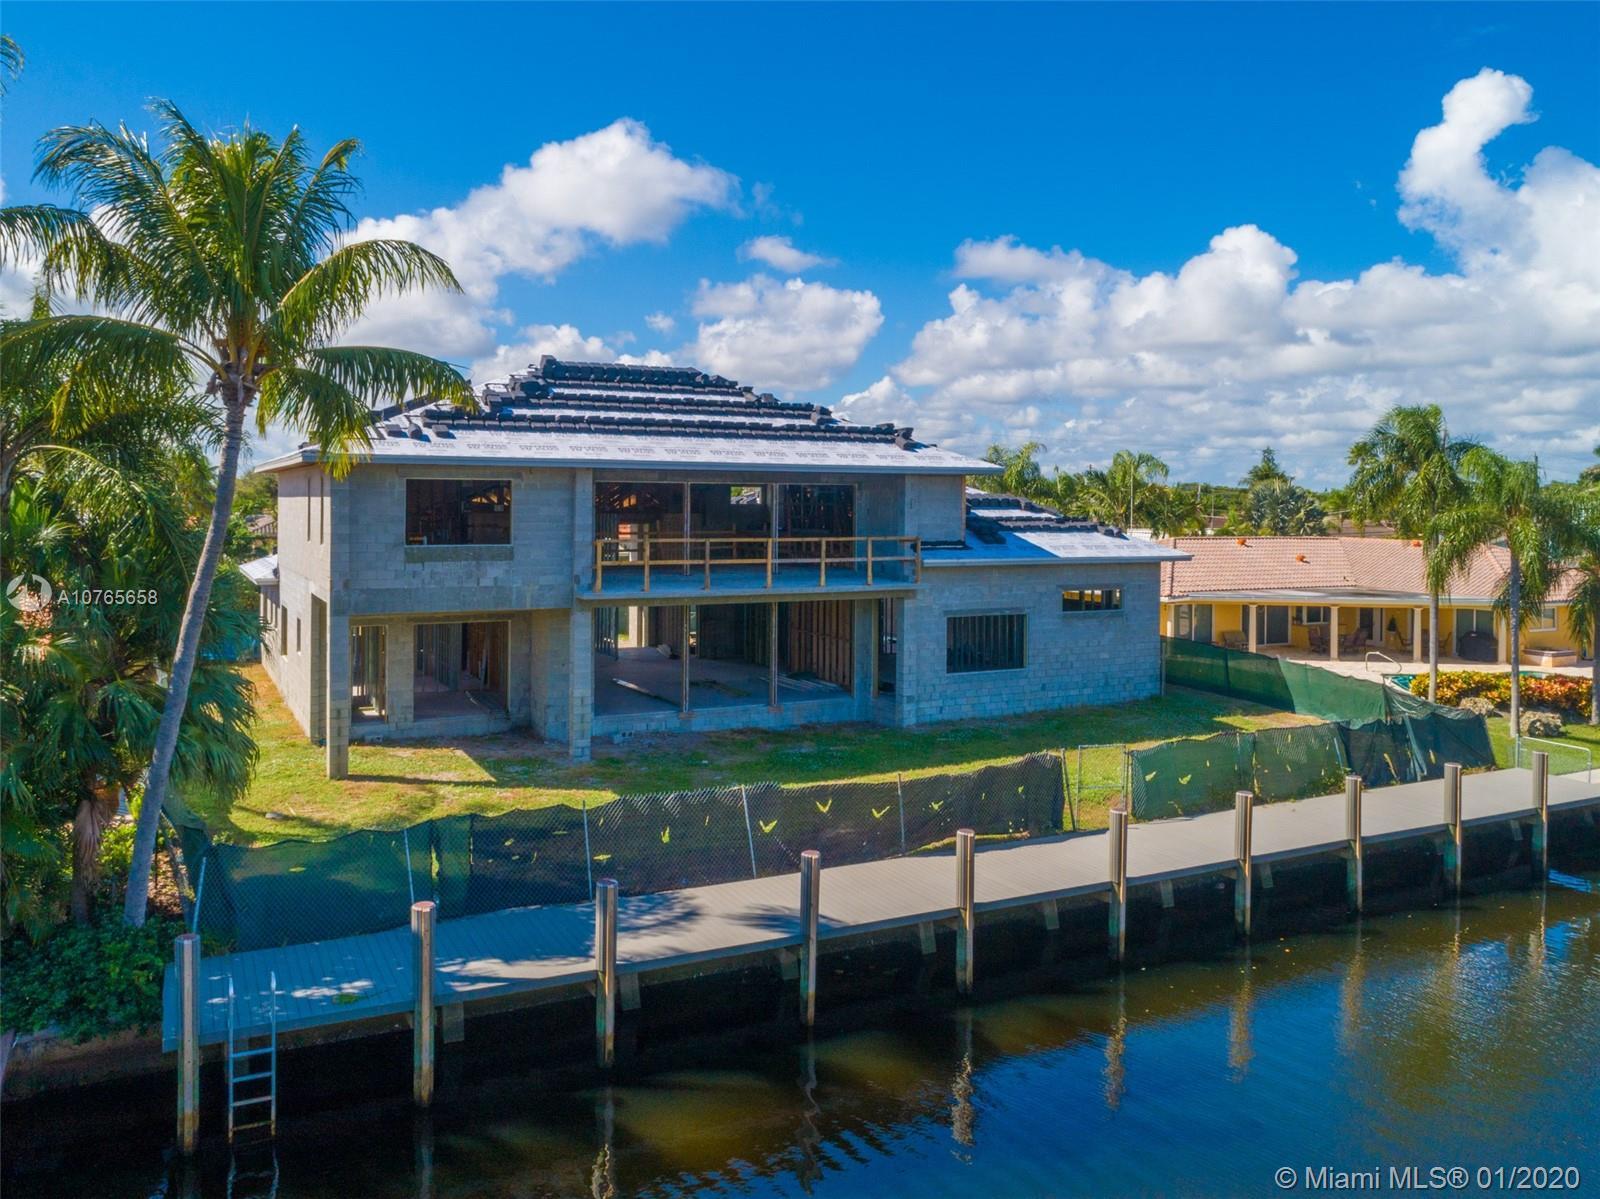 Pompano Waterway Estates, 5130 NE 29th Ave, Lighthouse Point, Florida 33064